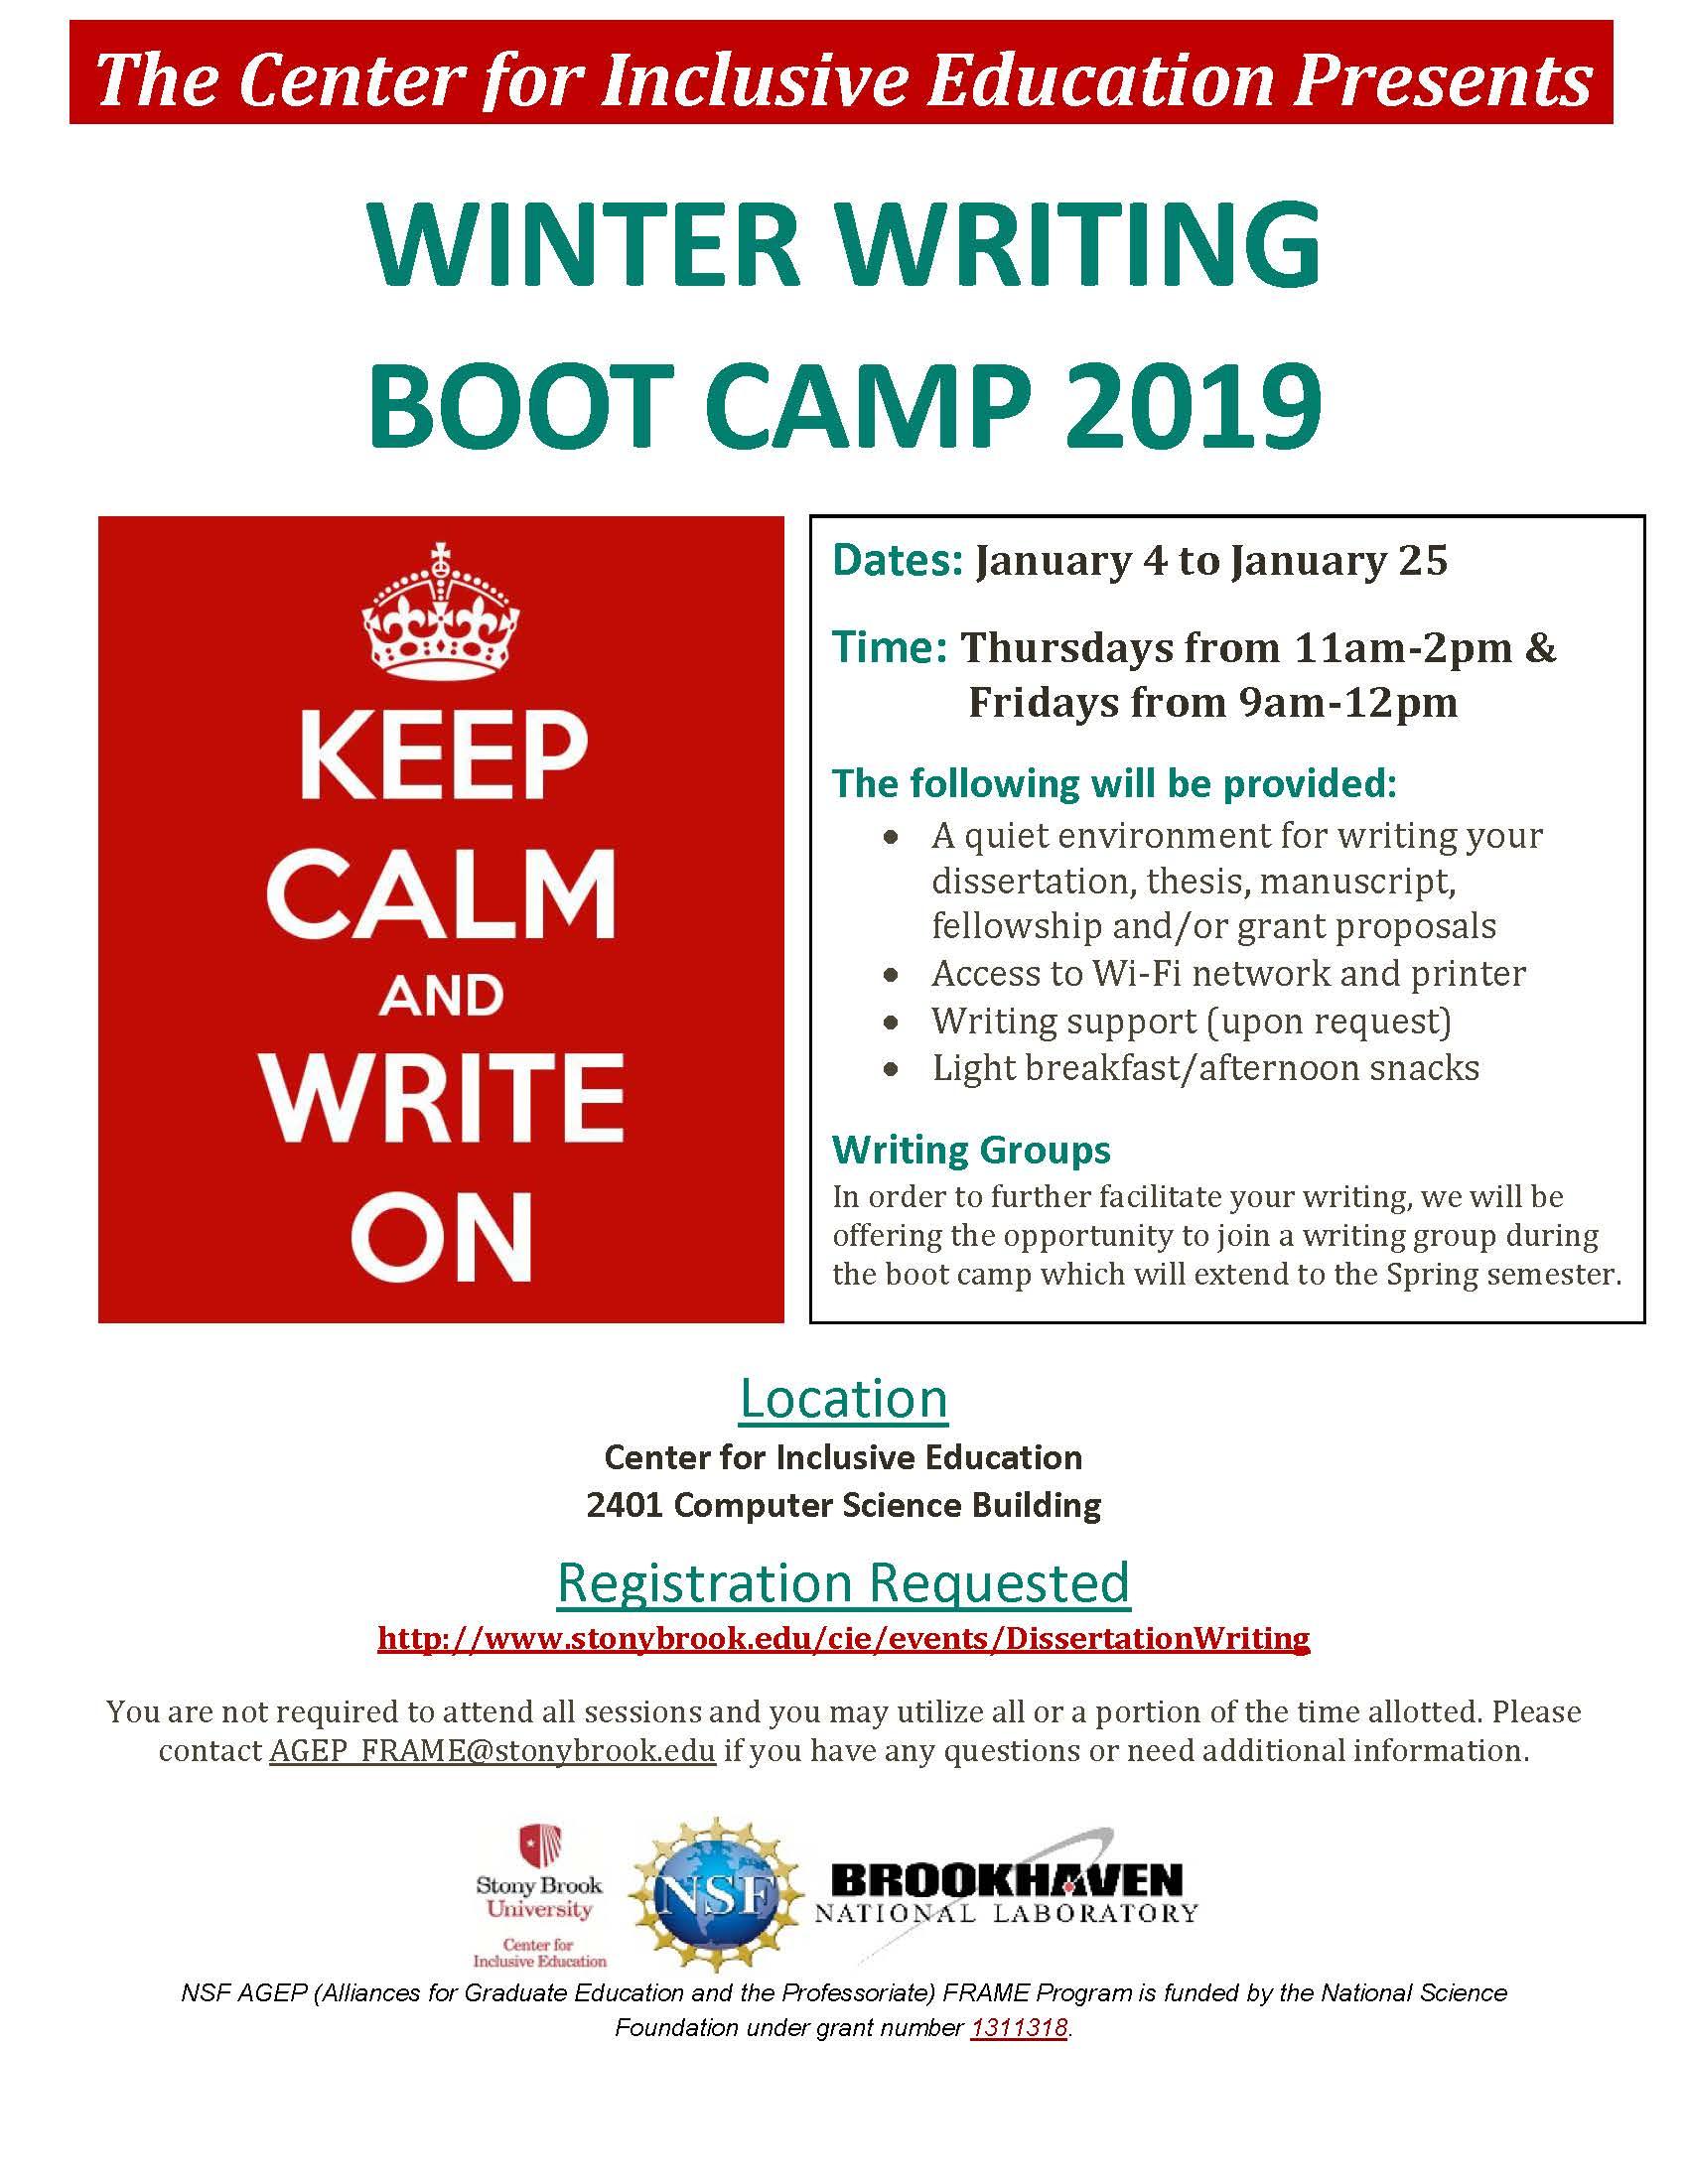 Stony Brook Calendar 2019 Graduate School   CIE Winter Writing Boot Camp 2019